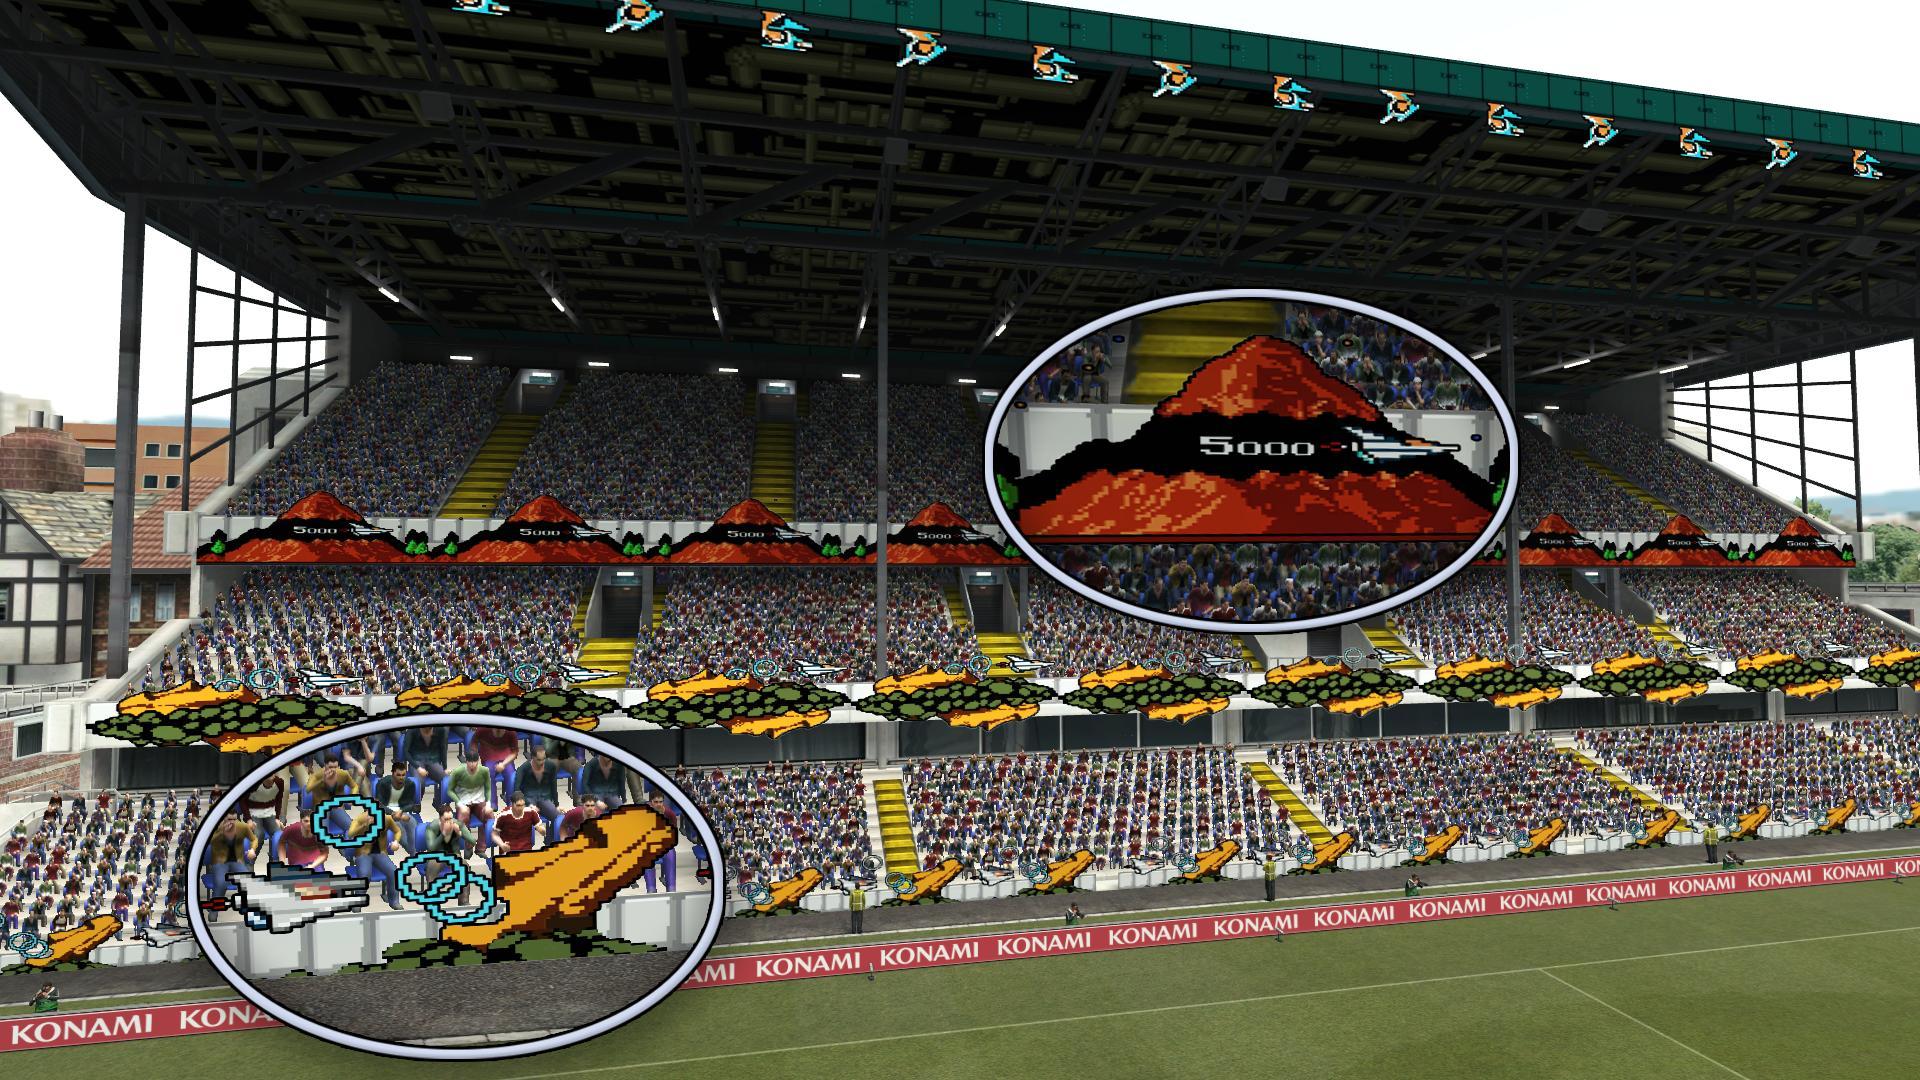 Pro Evolution Soccer 2011 - král je mrtev? 9316